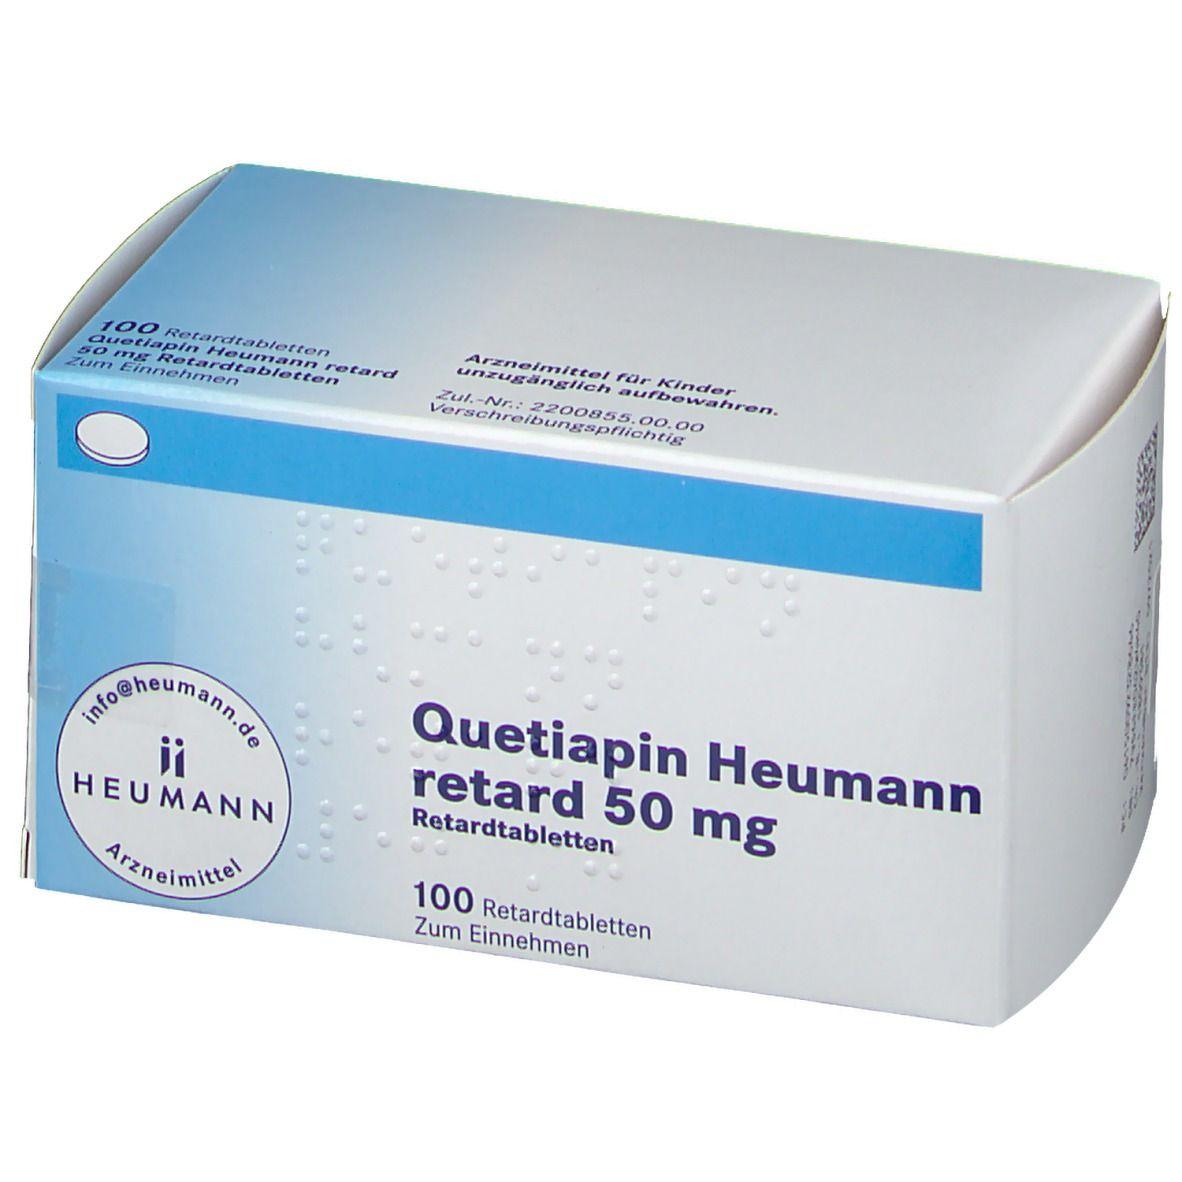 Quetiapin Heumann retard 20 mg 20 St   shop apotheke.com